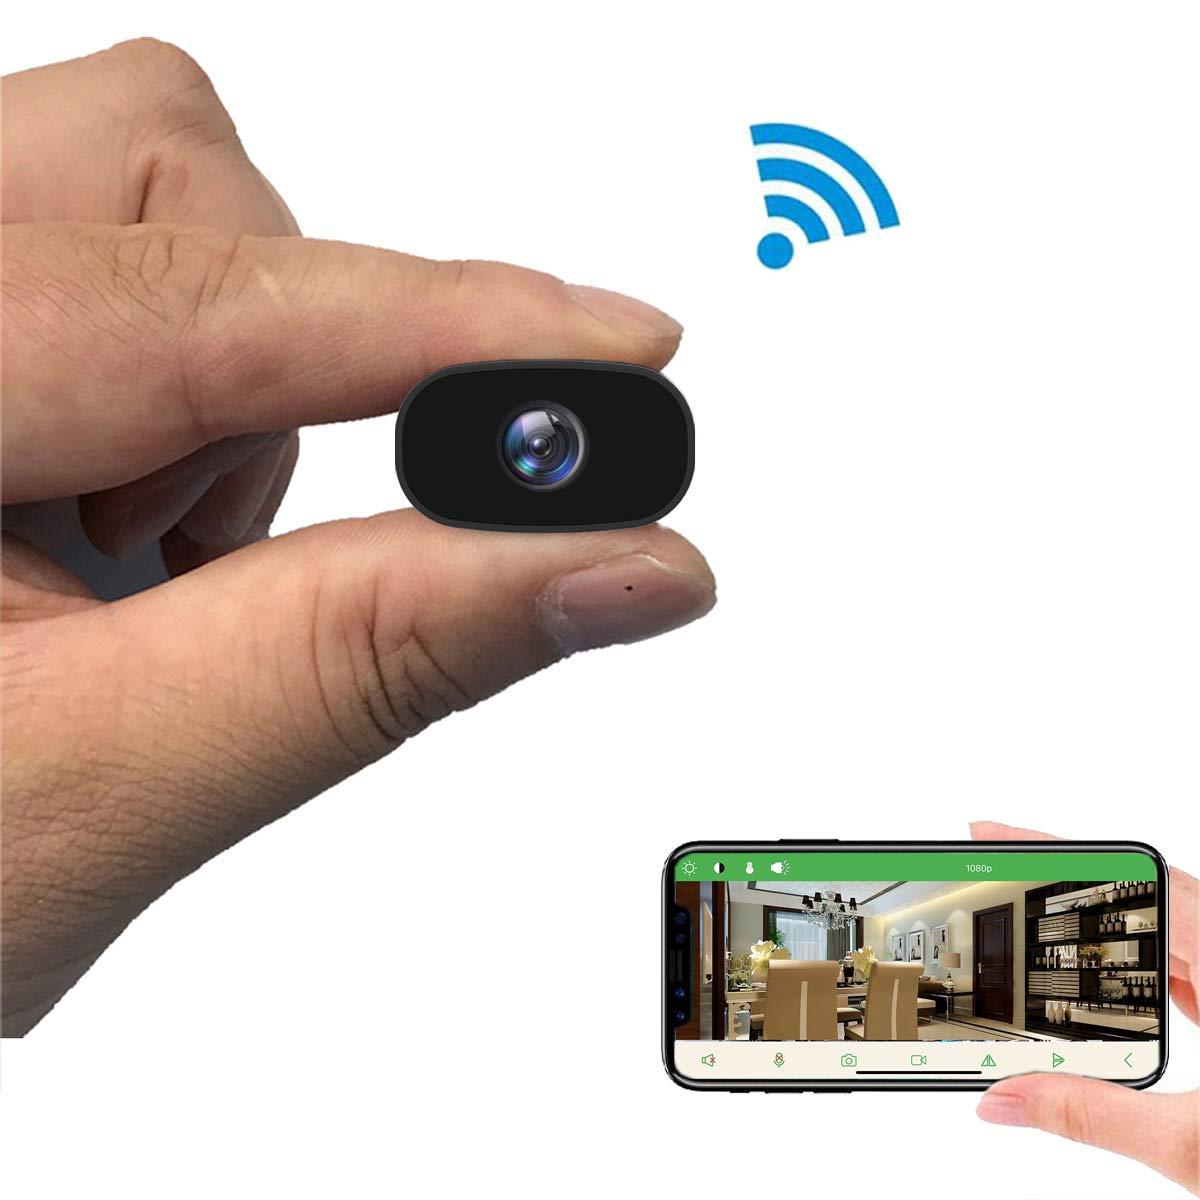 Mini Hidden outdoor Cameras-PNZEO W3 Spy Cam Portable Wireless WiFi Remote View CameraMini Hidden outdoor Cameras-PNZEO W3 Spy Cam Portable Wireless WiFi Remote View Camera